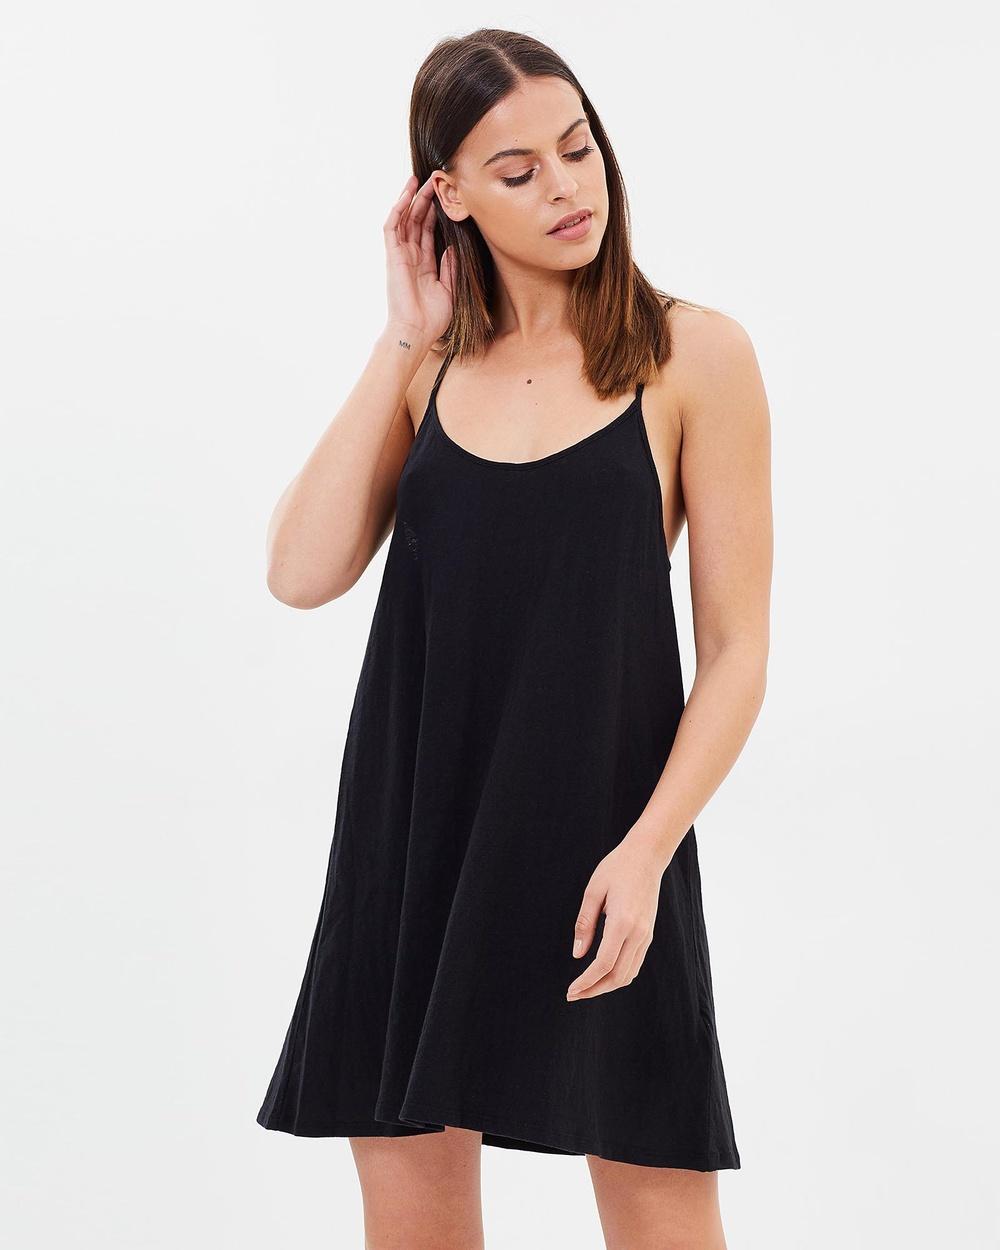 Rusty Bare Tank Dress Dresses Black Bare Tank Dress